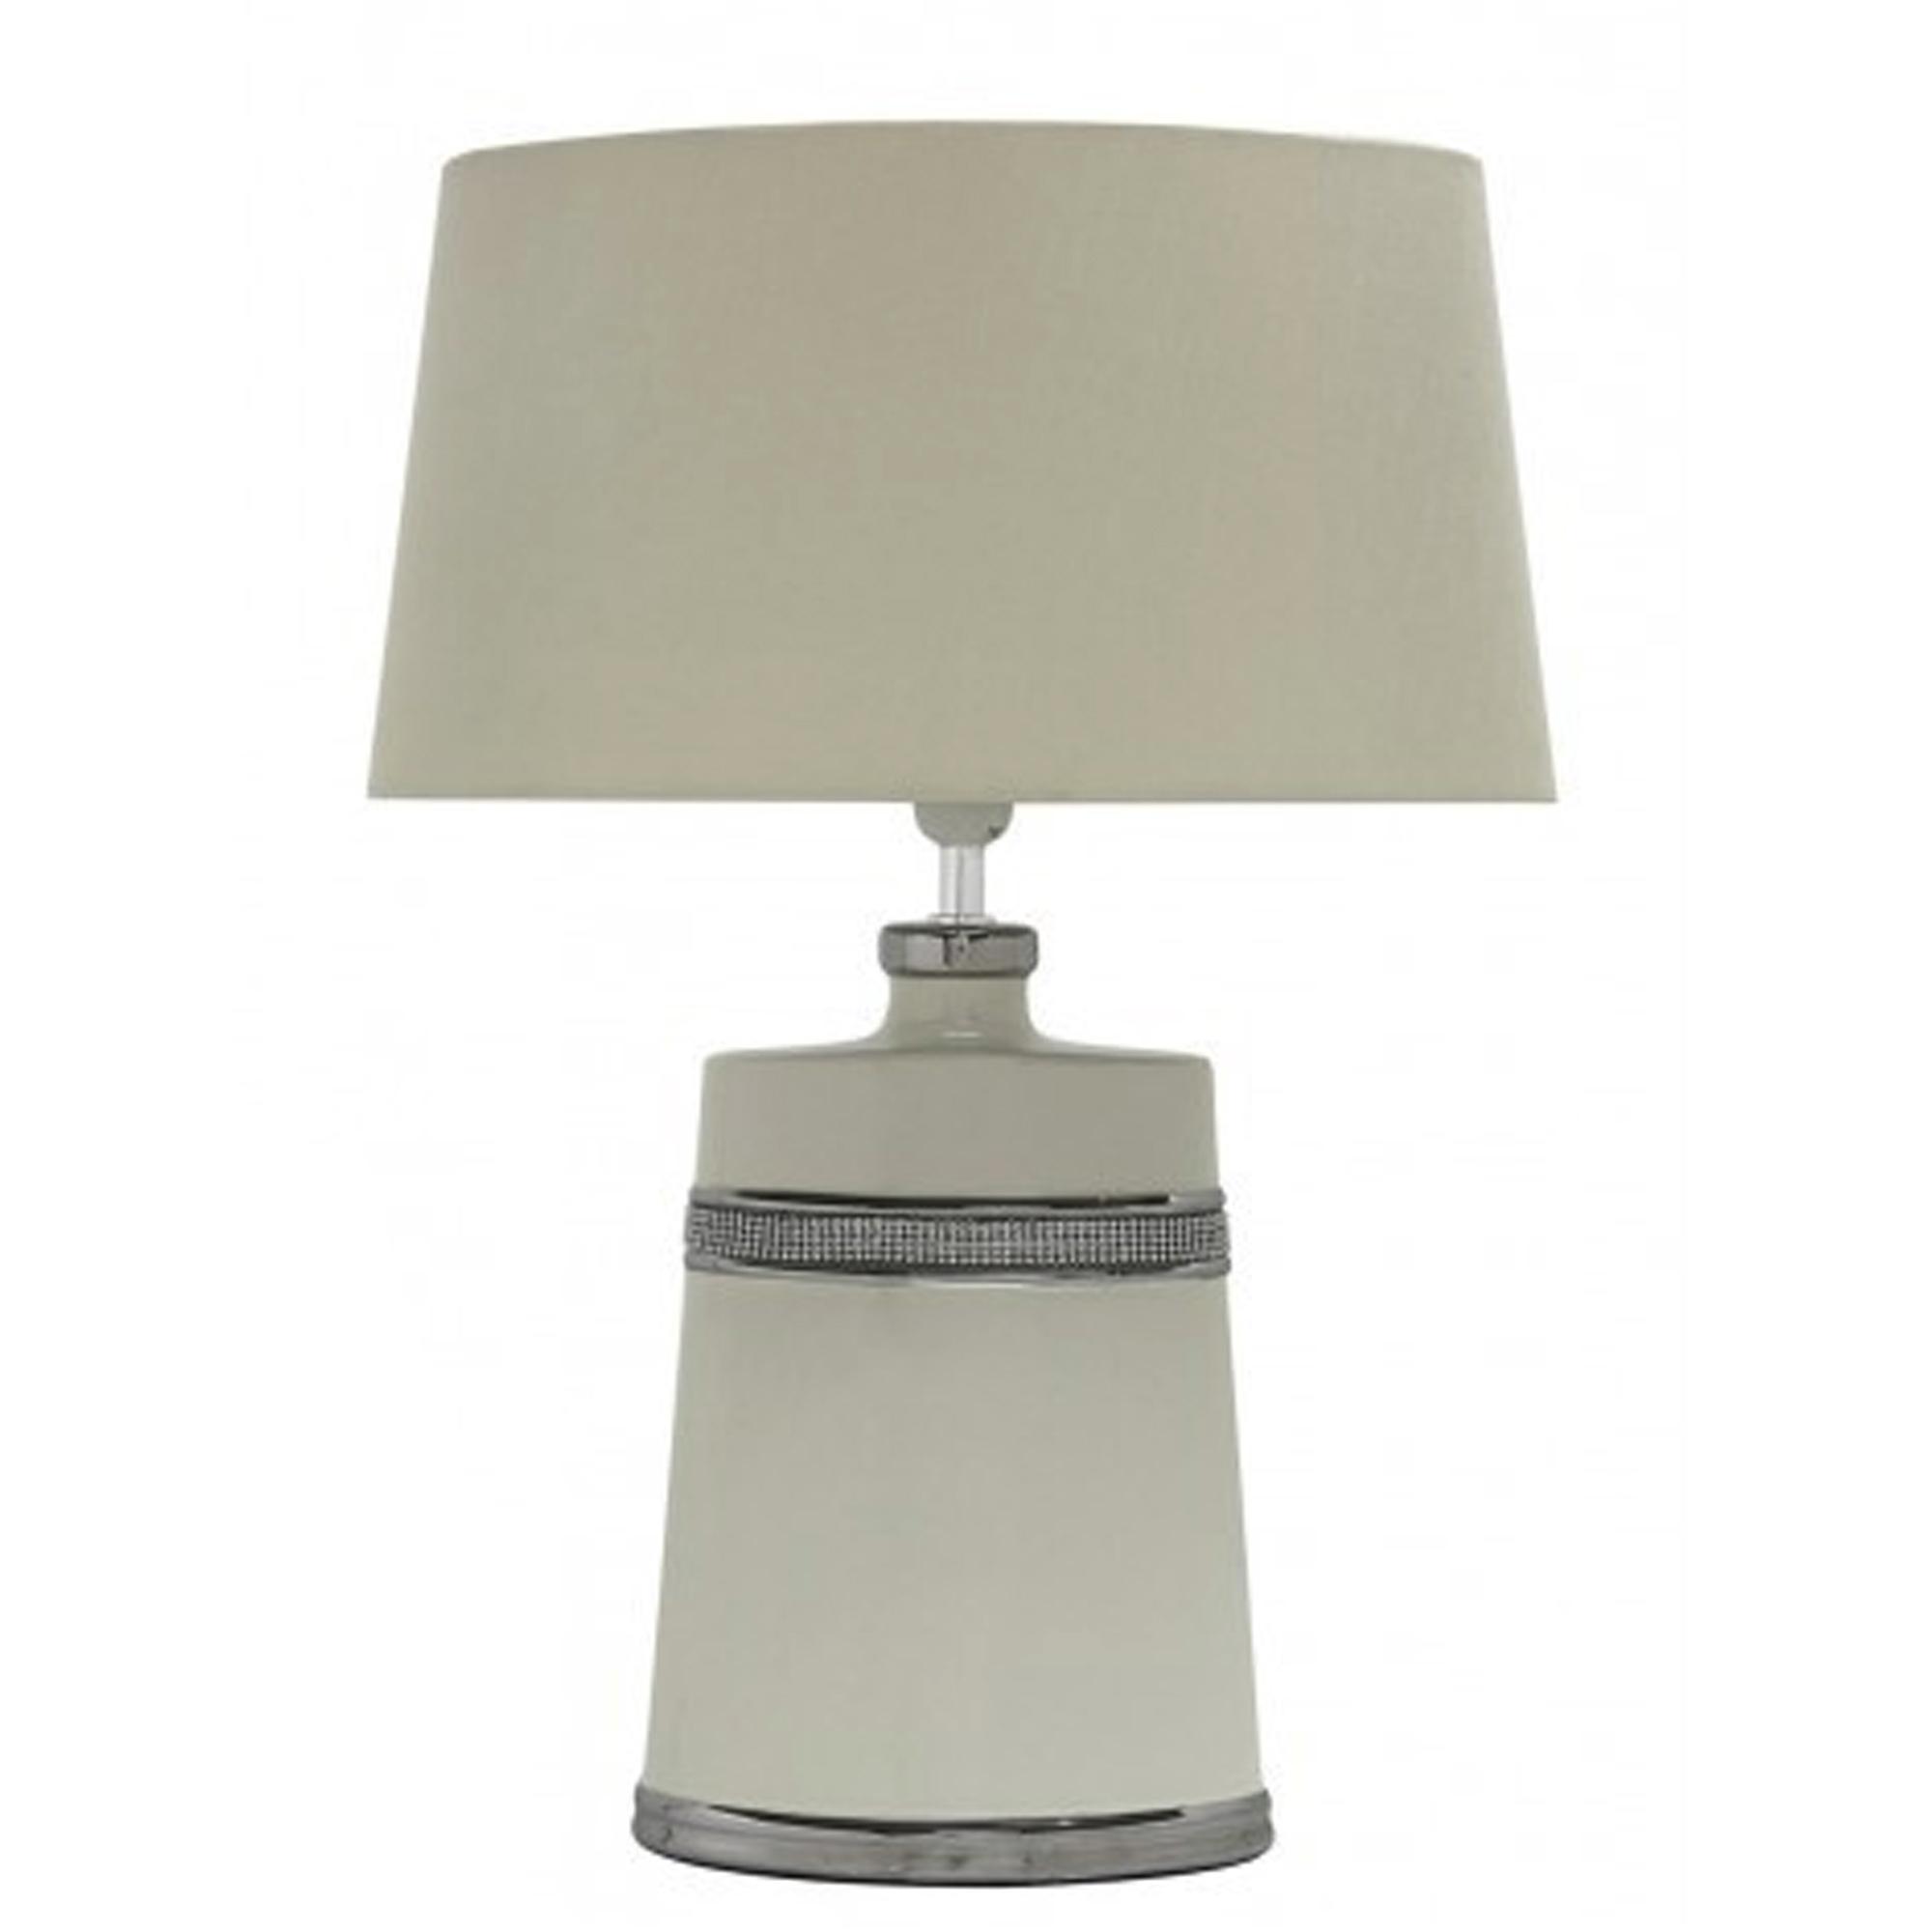 Cream modern table lamp table lamps cream modern table lamp aloadofball Choice Image